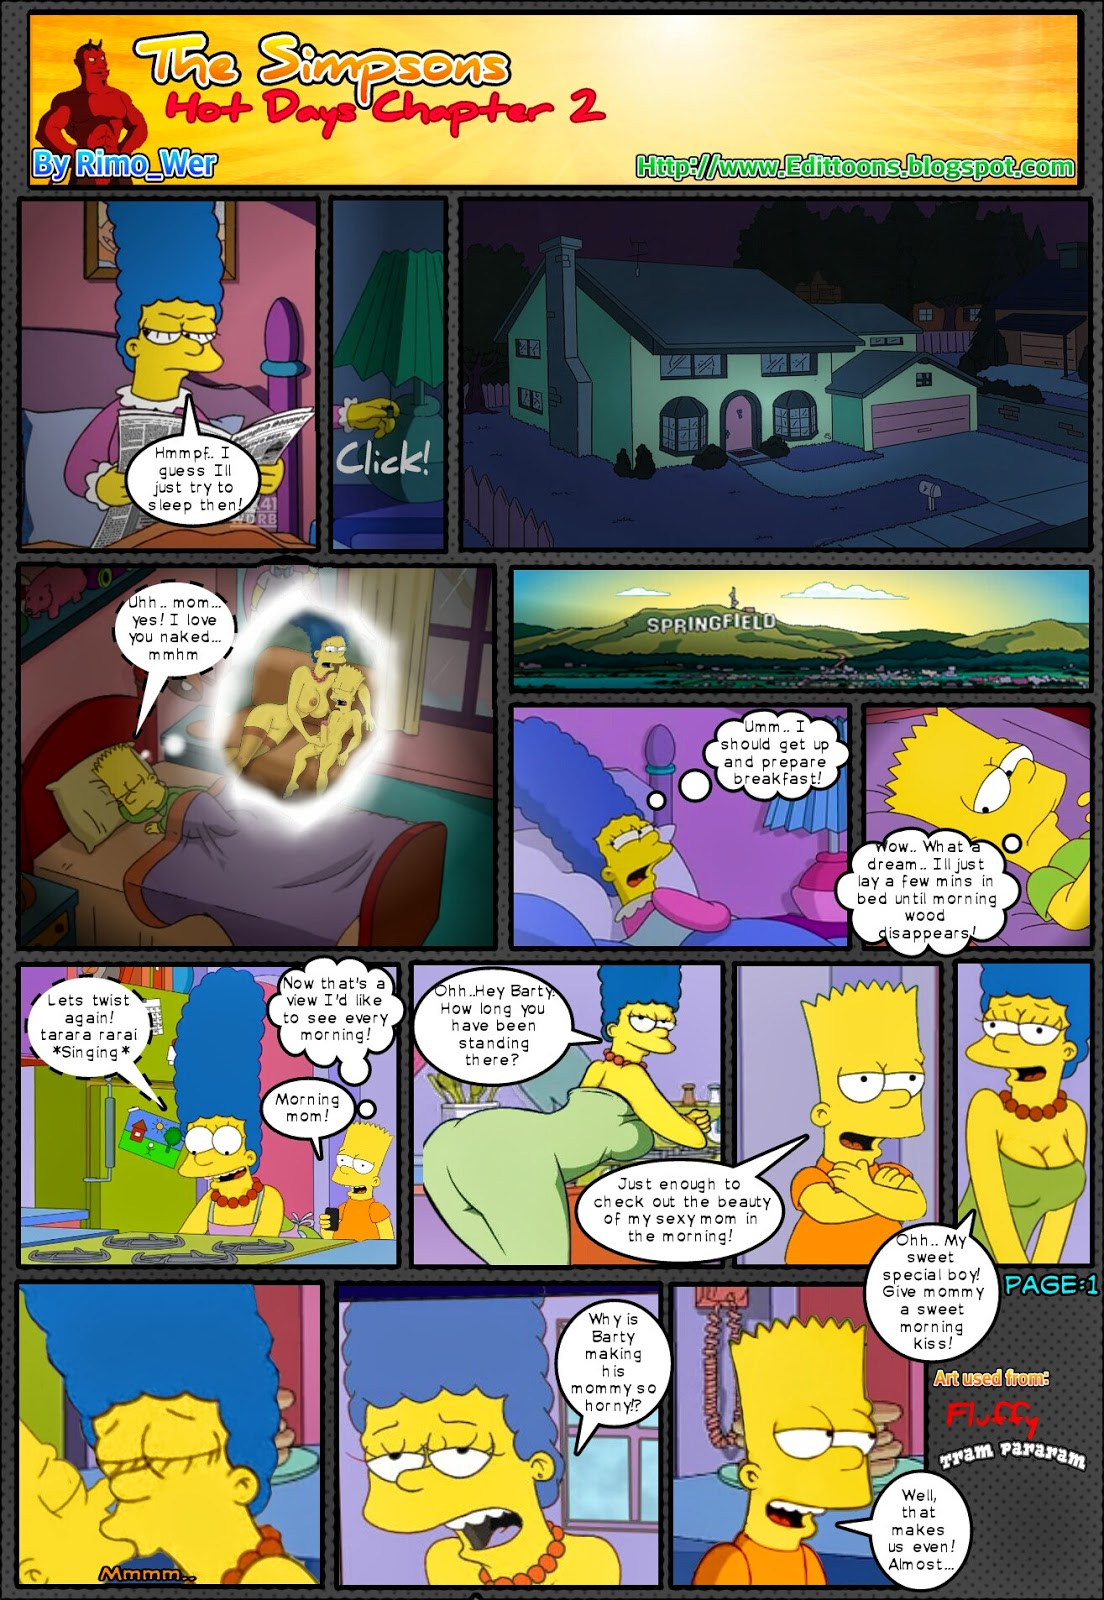 Goodcomix The Simpsons - Hot Days.2 (Unfinished) xxx porno